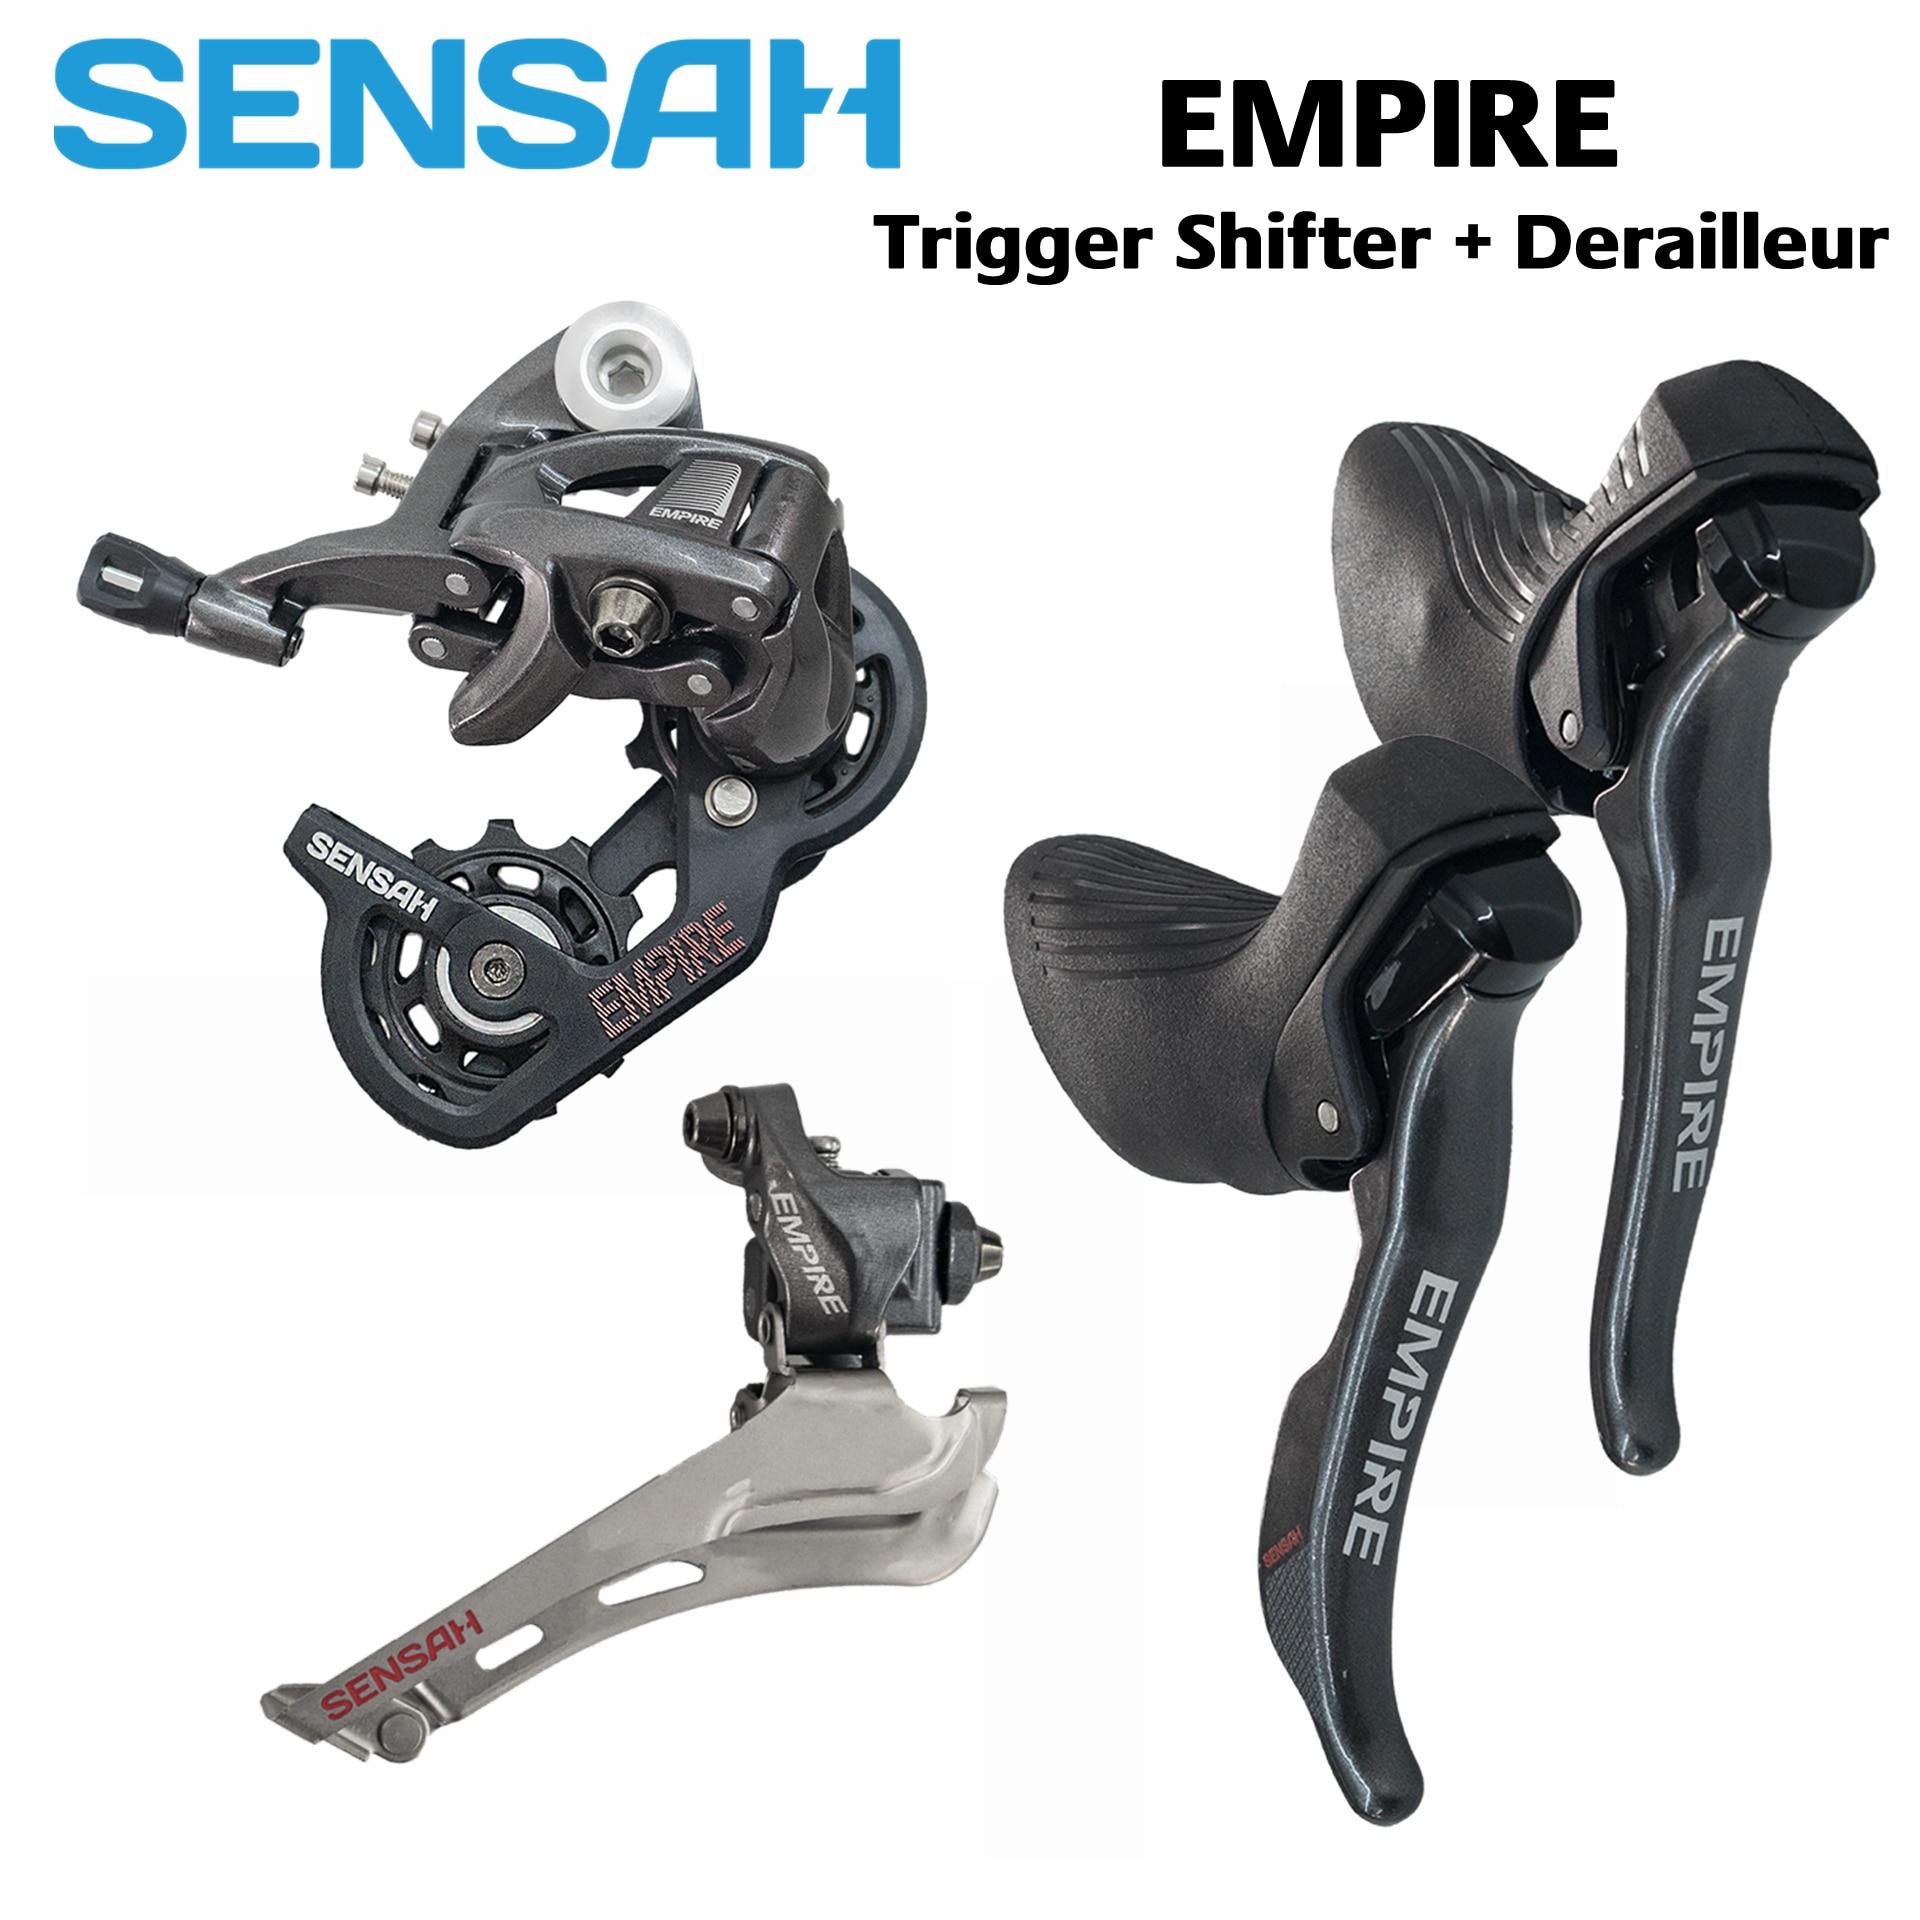 SENSAH EMPIRE 2x11 Speed 22s Road Groupset Shifter Rear Derailleurs Front Derailleurs 5800 R7000